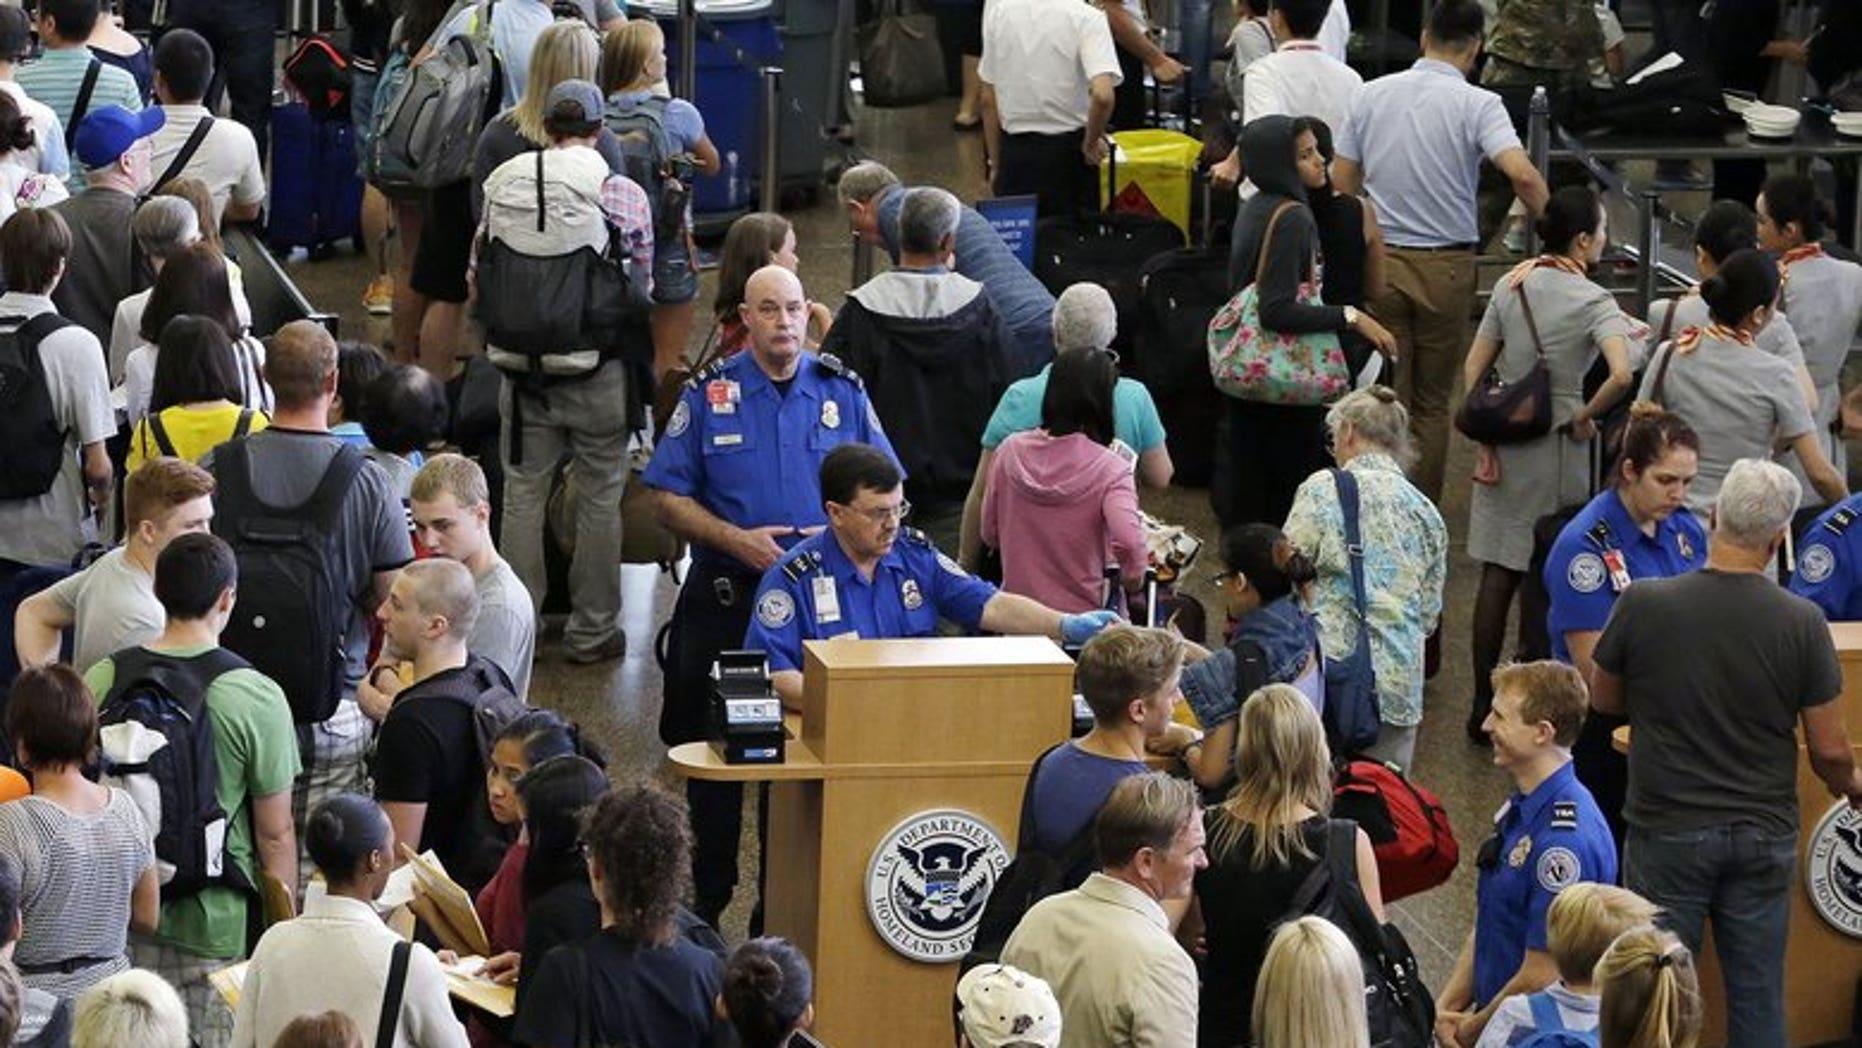 Travelers at Seattle-Tacoma International Airport wait to go through TSA security.